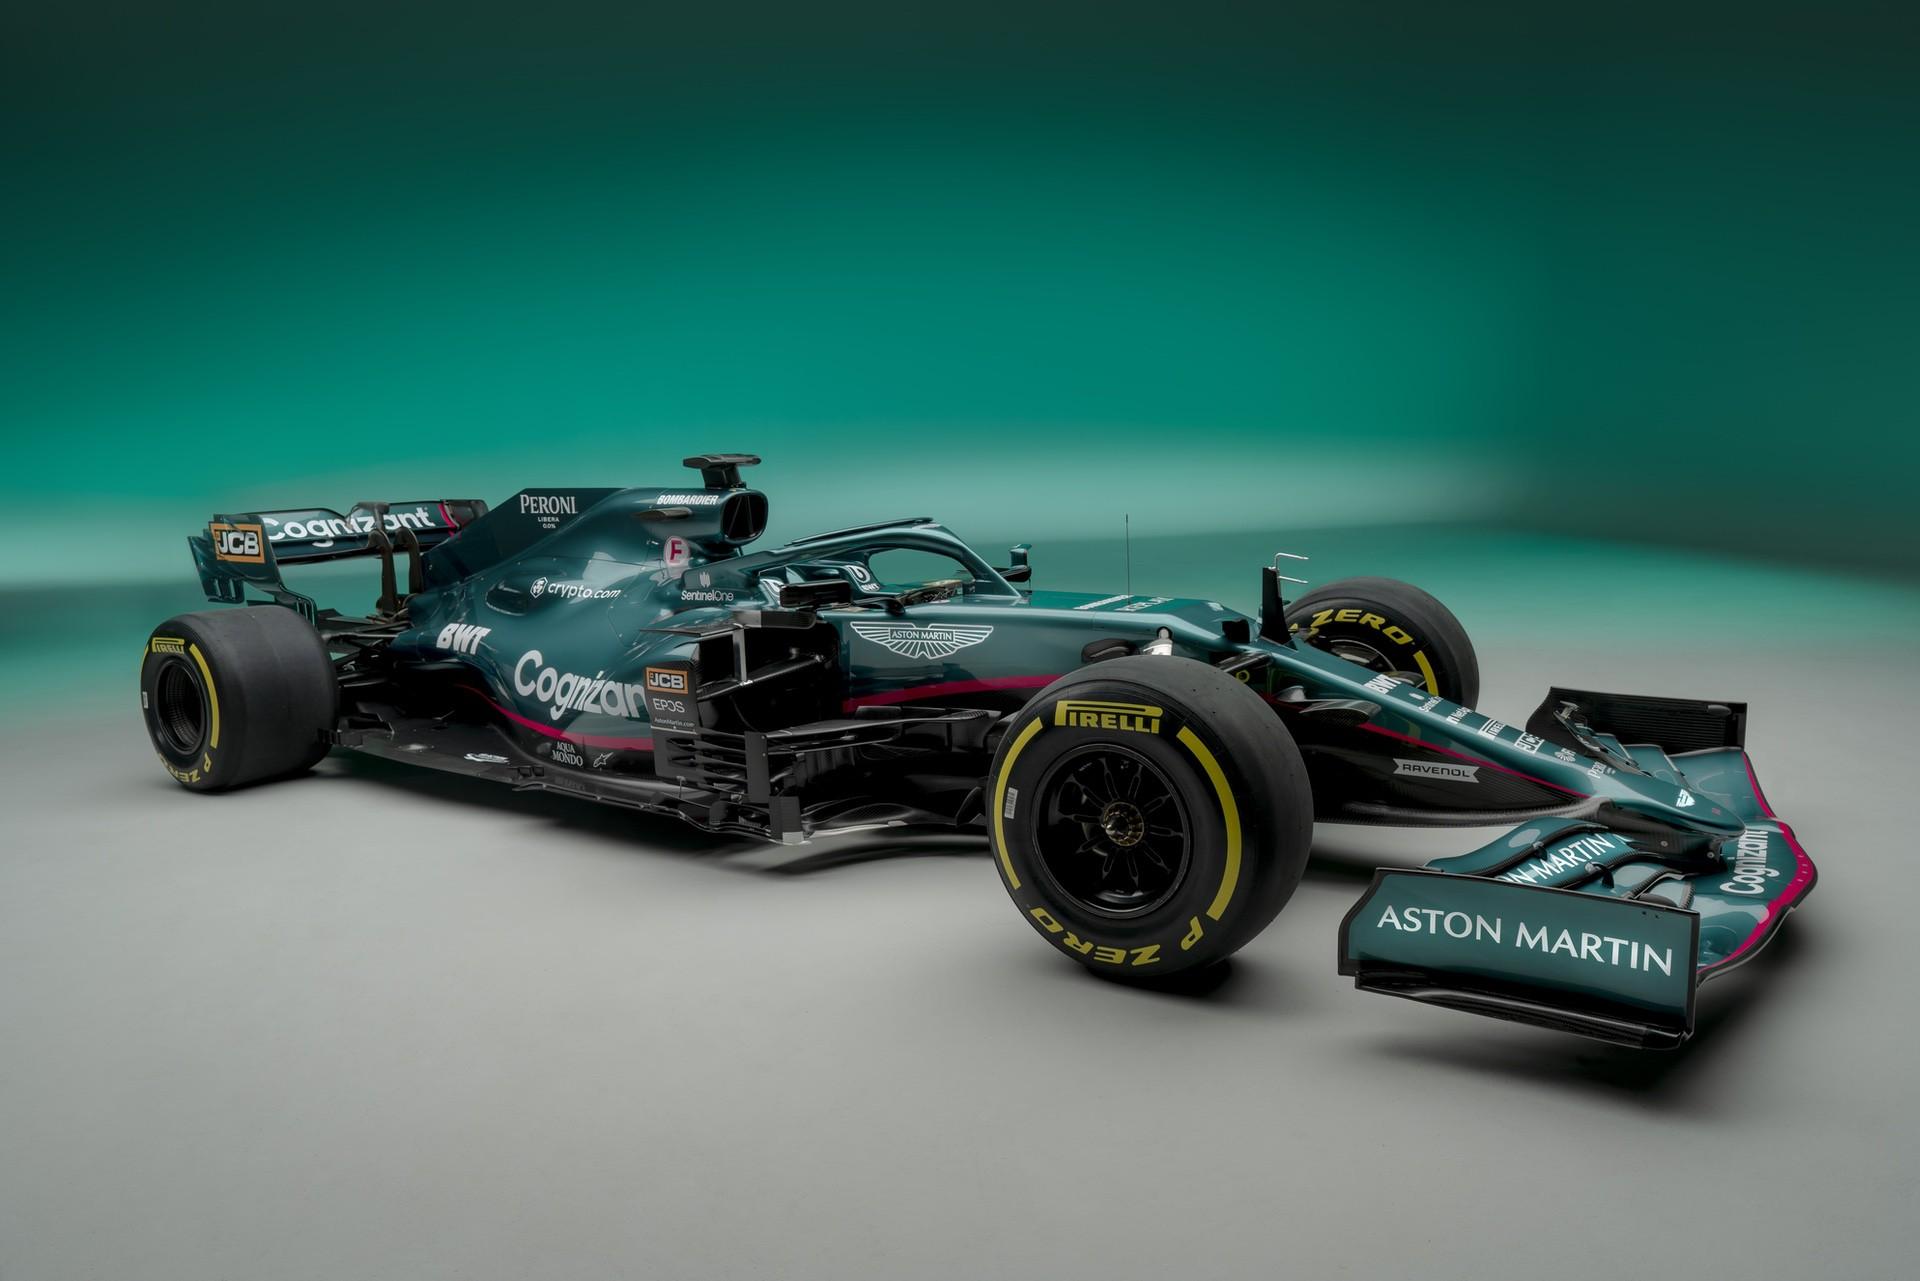 Aston-Martin-Cognizant-Formula-One-TeamAMR2101